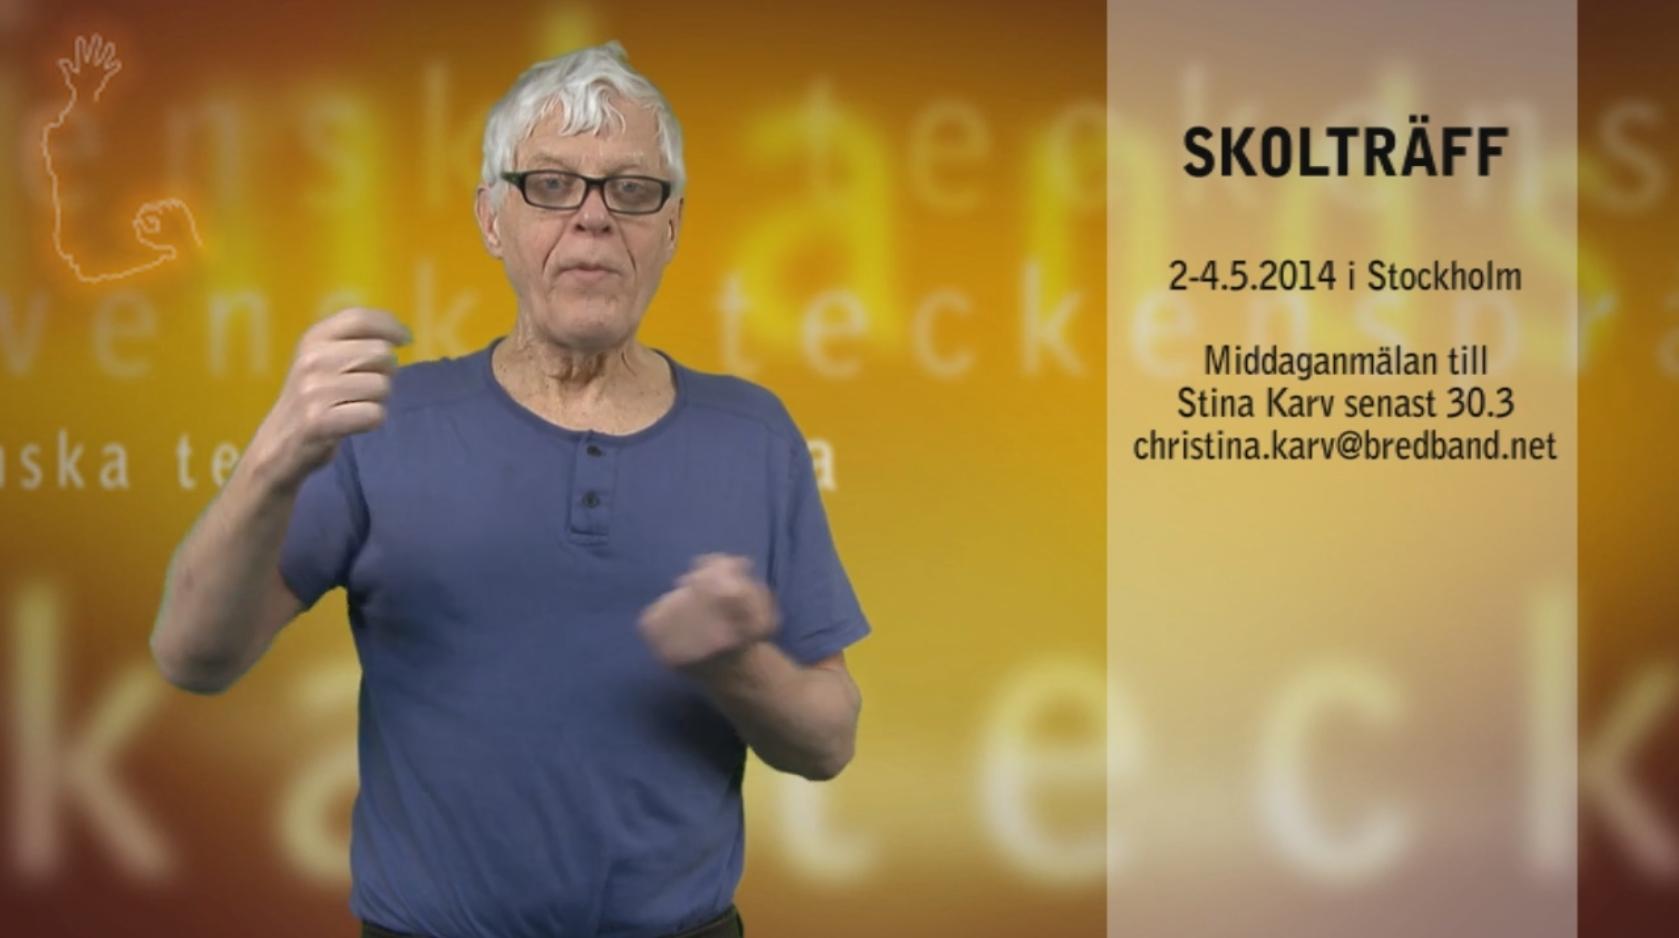 Skolträffen i Stockholm